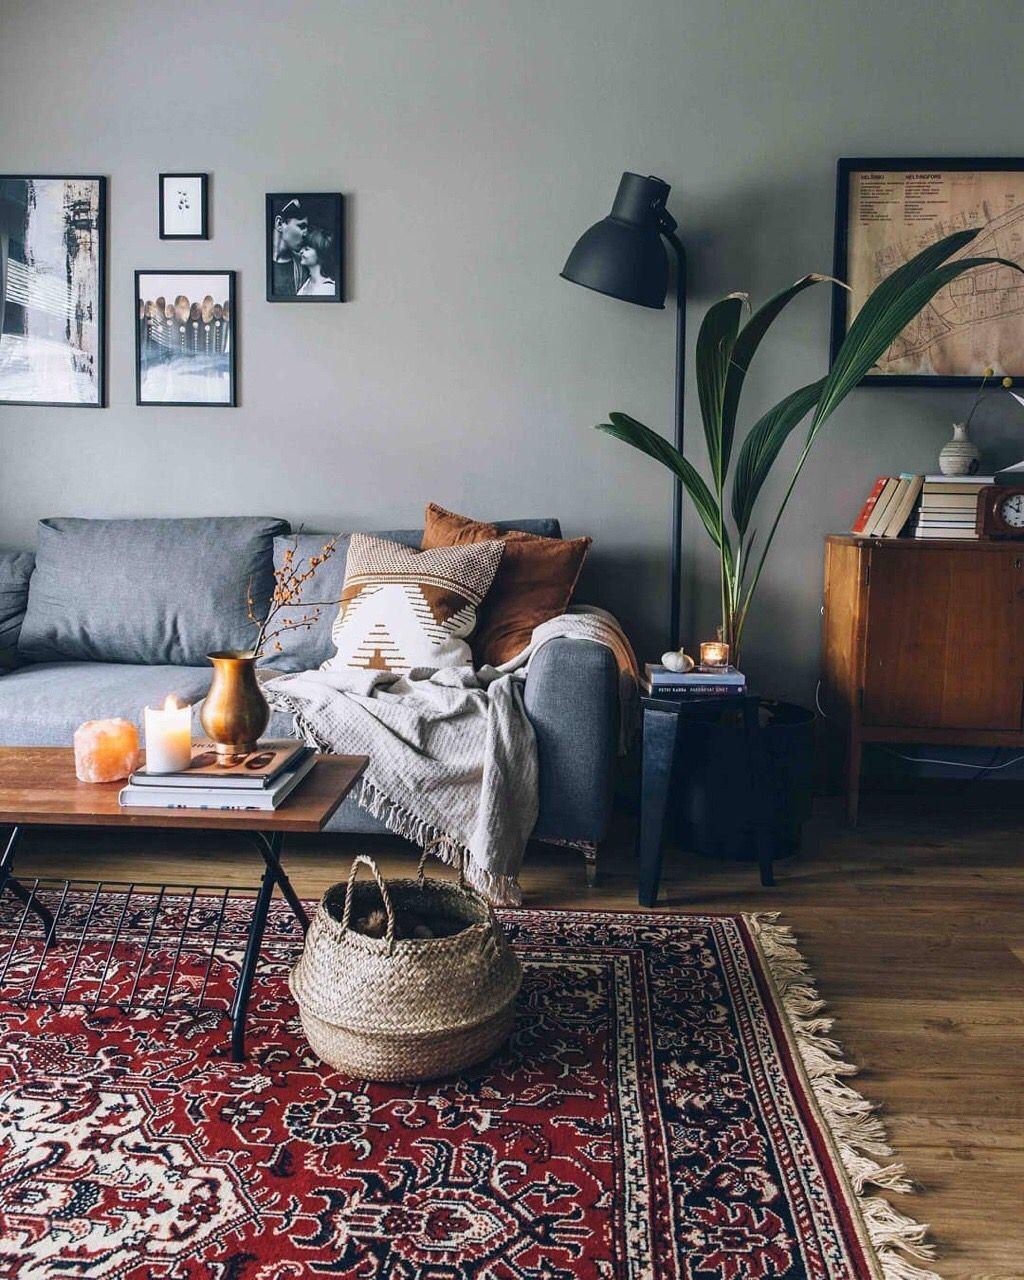 Klassiek vloerkleed in de woonkamer. Zorgt voor een warme sfeer in de kamer. #klassiek #modern #vloerkleed #rug Kelims in the living #industrialinteriordesign